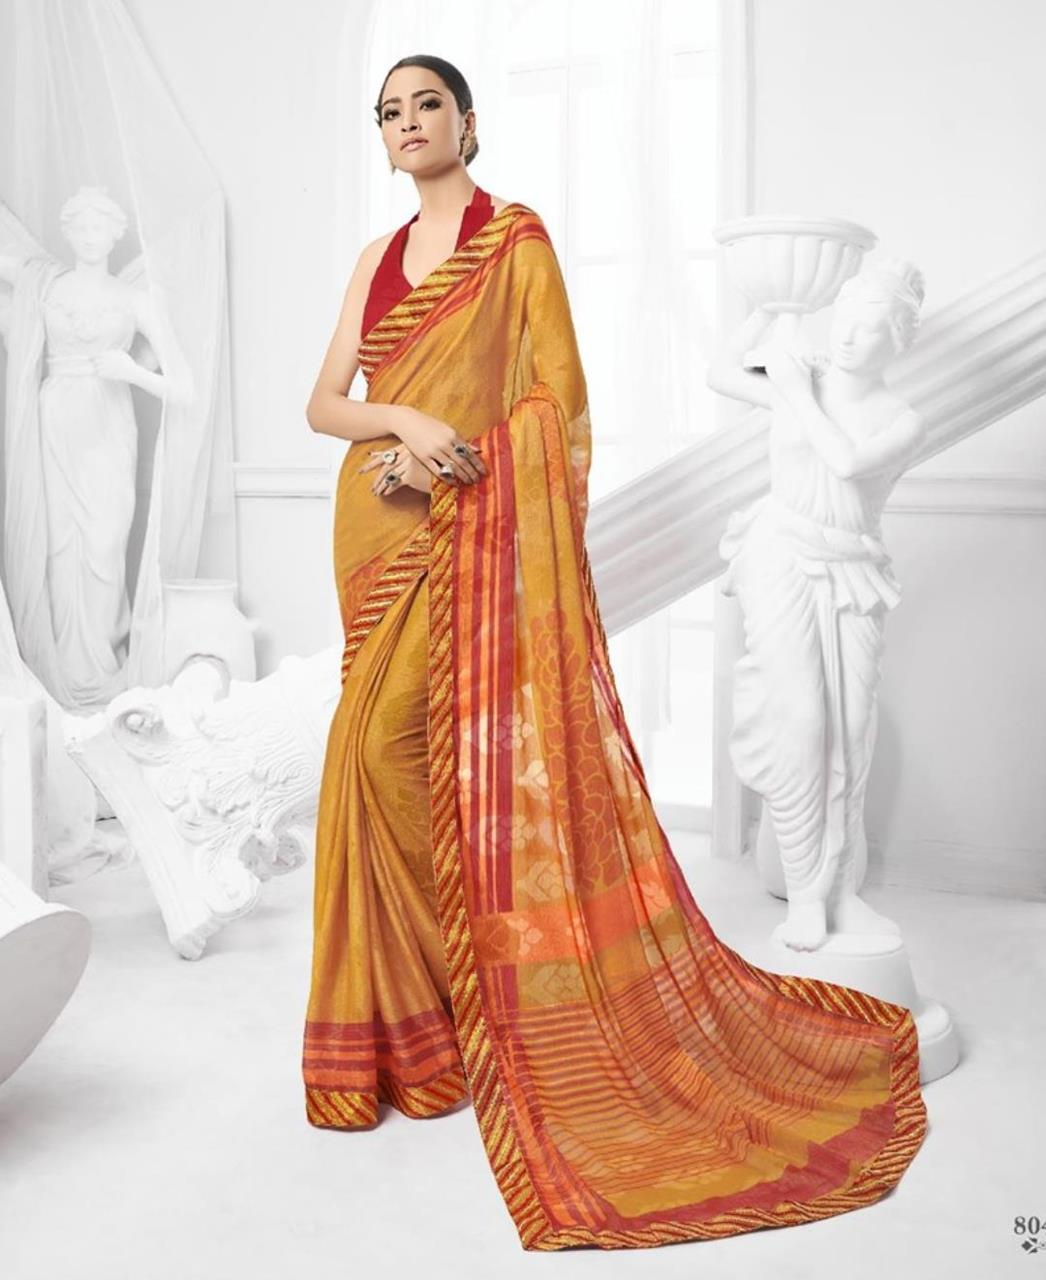 Printed Brasso Saree (Sari) in Yellow